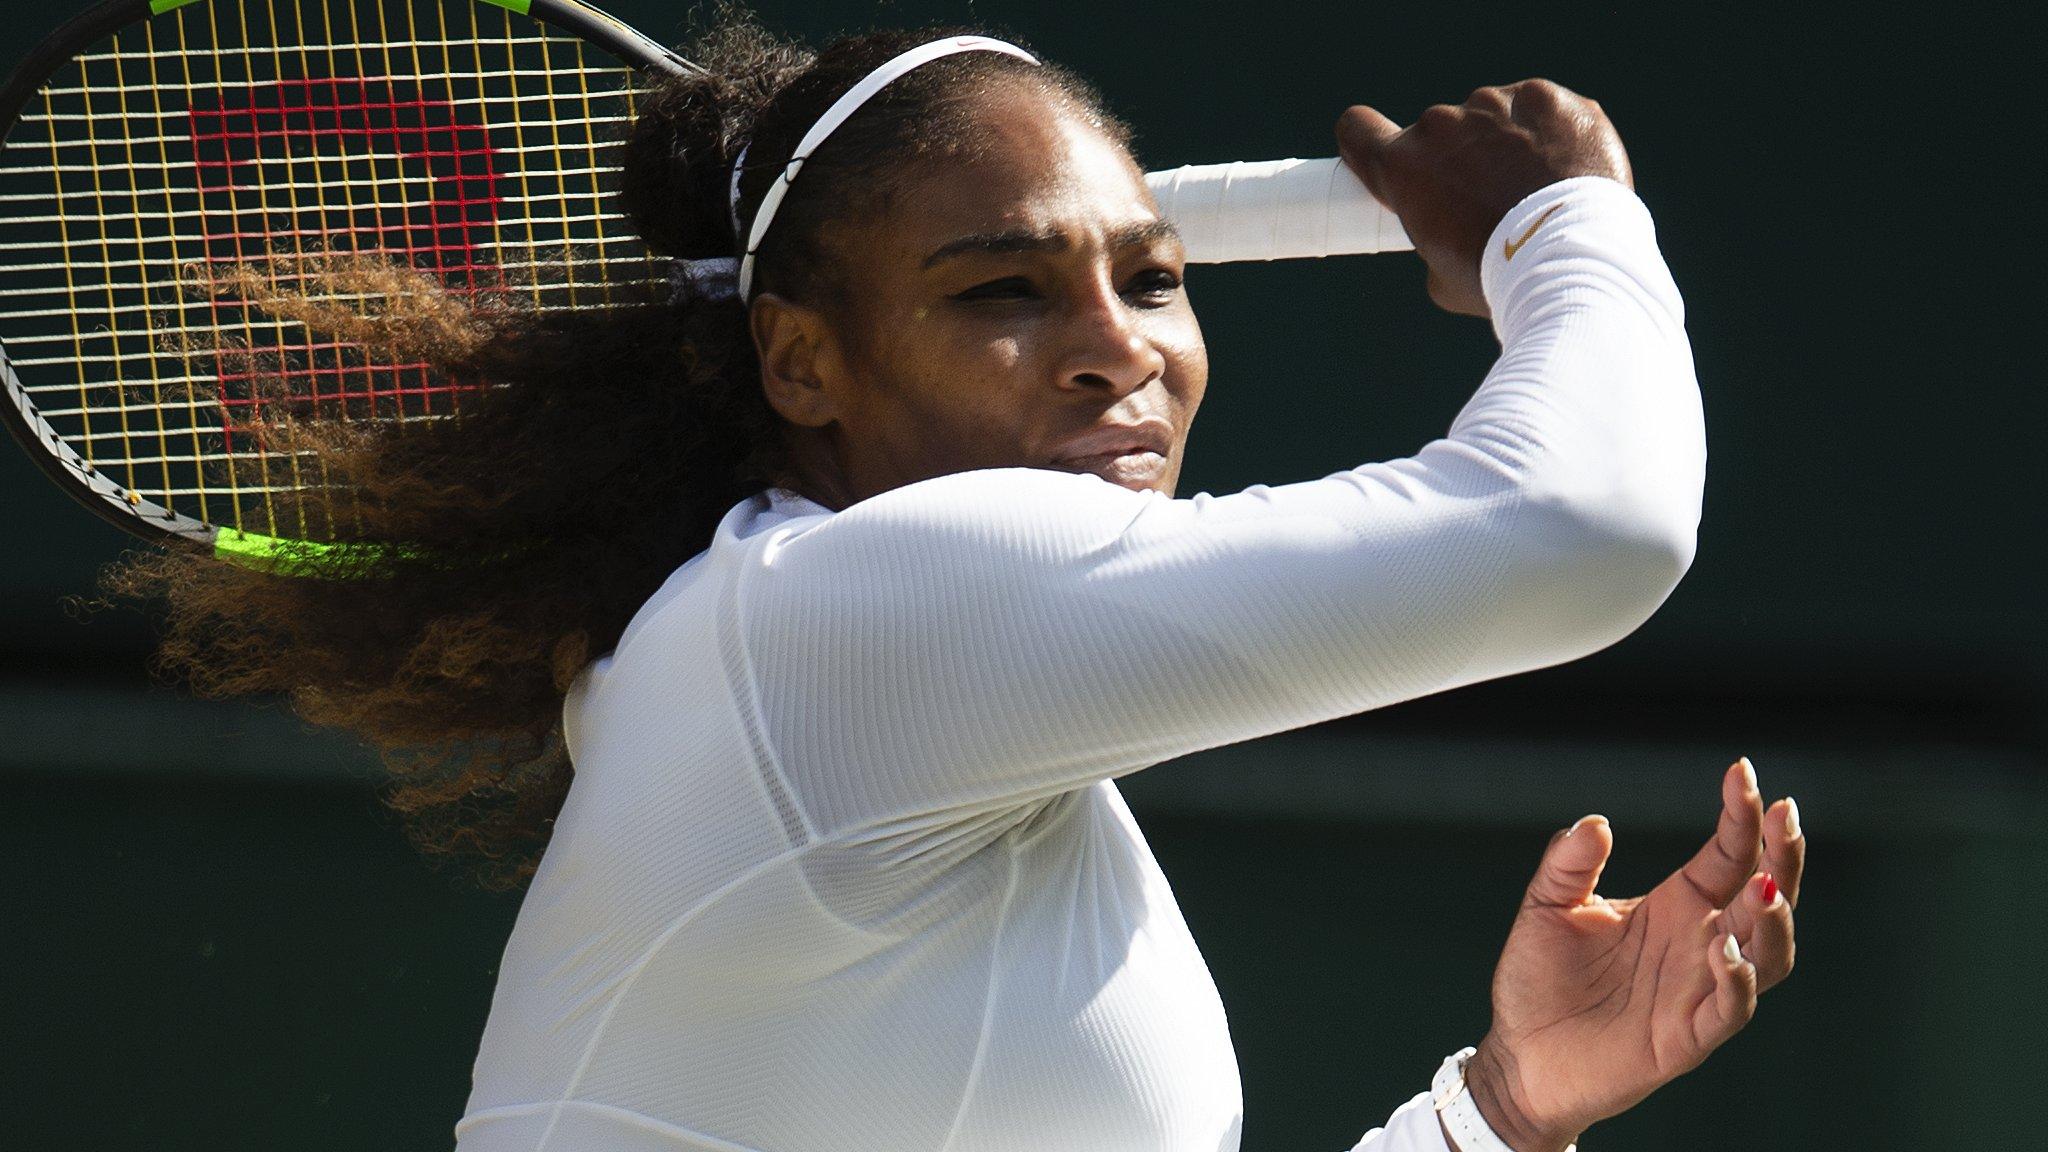 Williams returns to world's top 30 after run to Wimbledon final